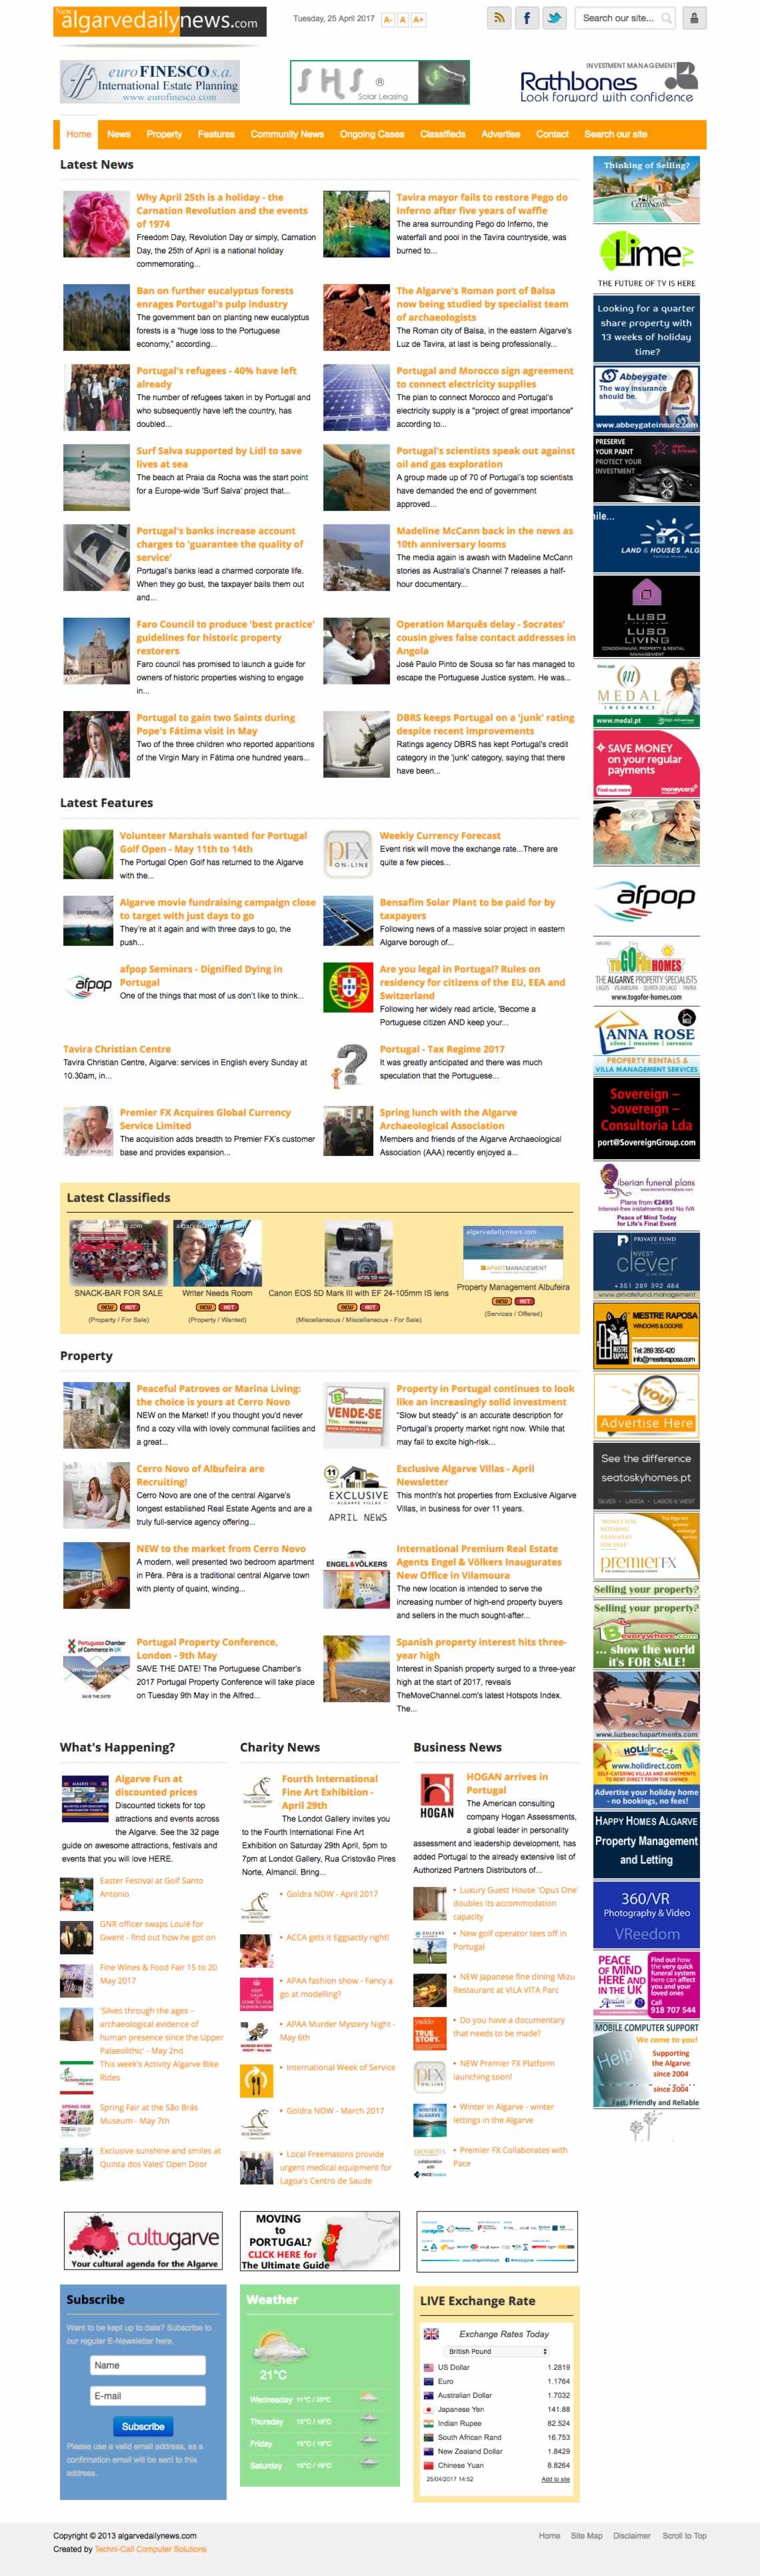 for Daily design news